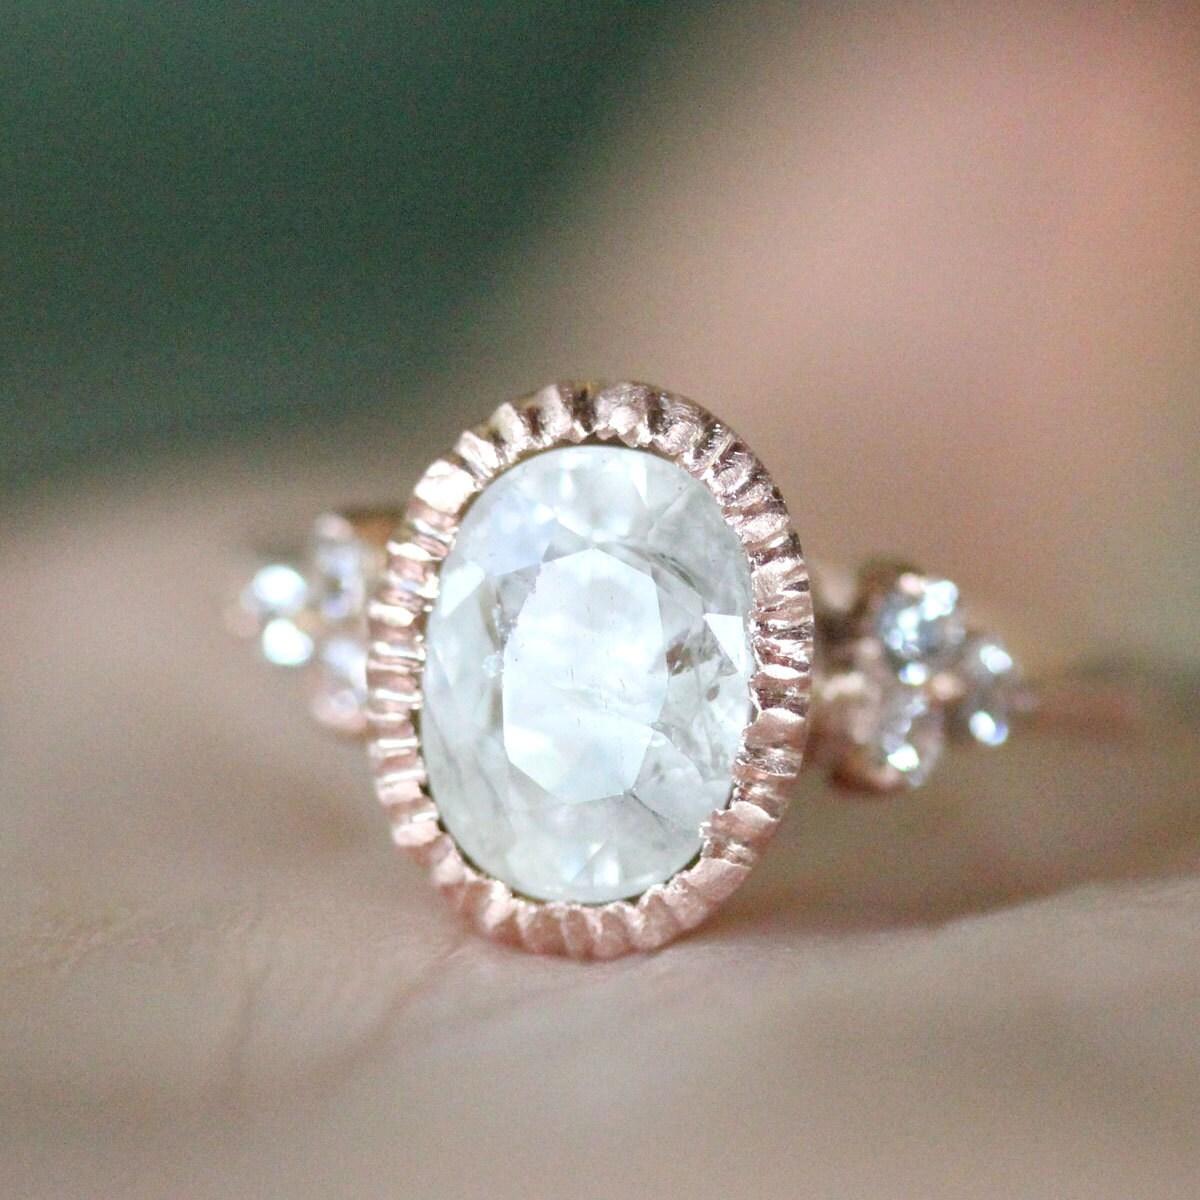 White Sapphire 14k Rose Gold Engagement Ring Gemstone Ring